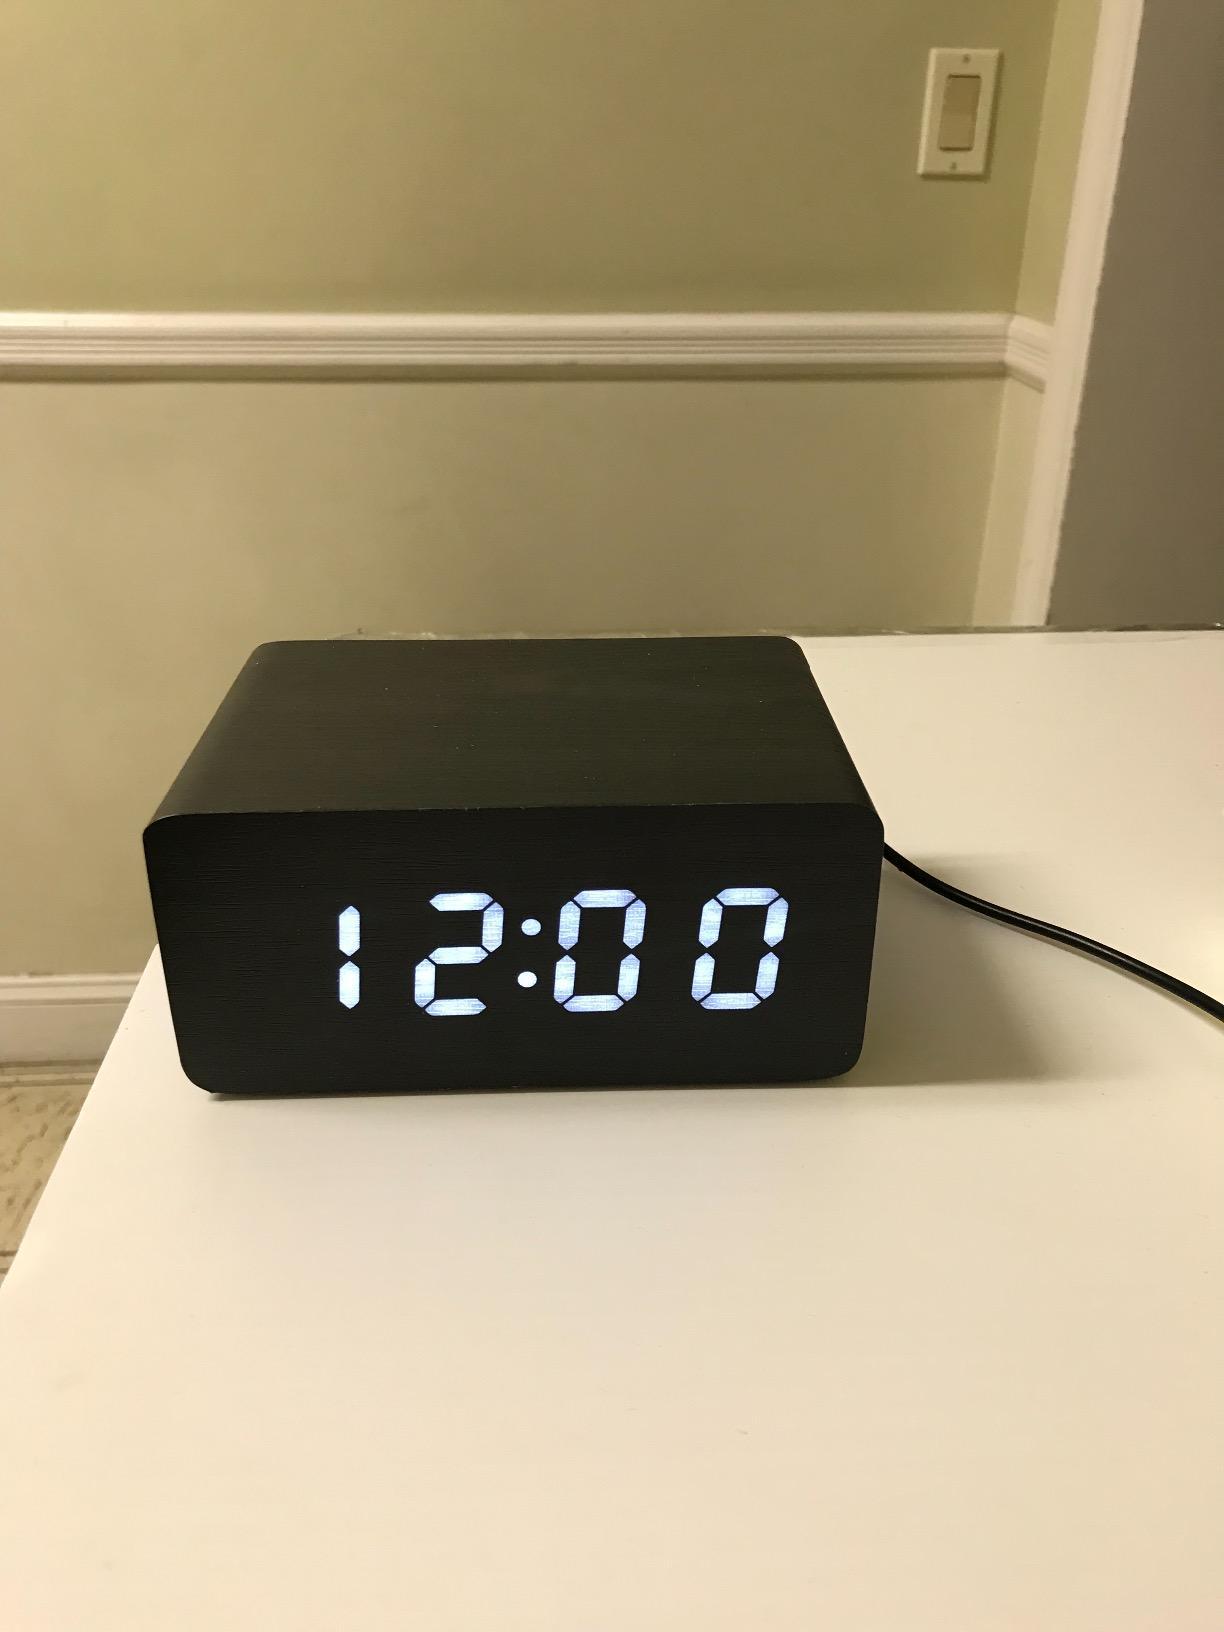 Triple Display Digital Alarm Clock Large White LED Display - Dual